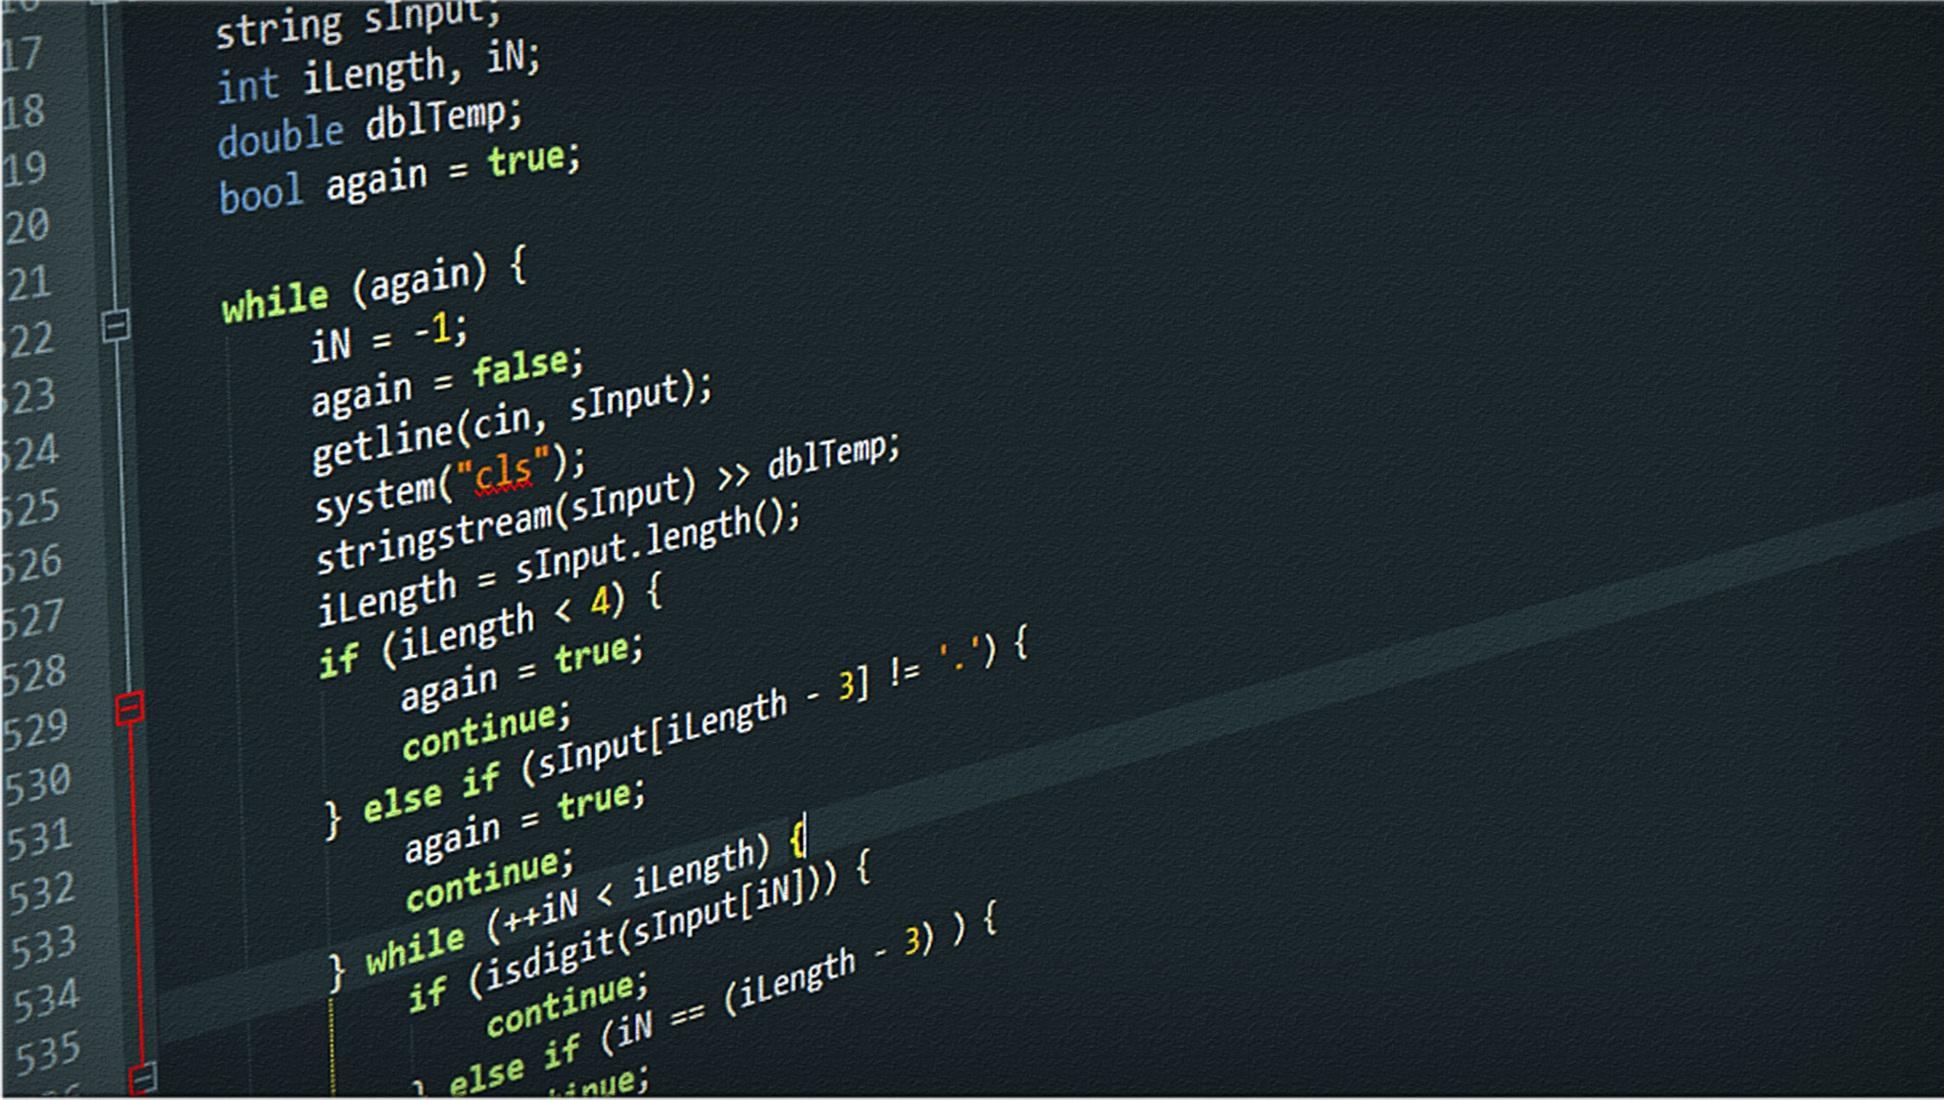 Hd Wallpaper C Programming 497794 Hd Wallpaper Backgrounds Download